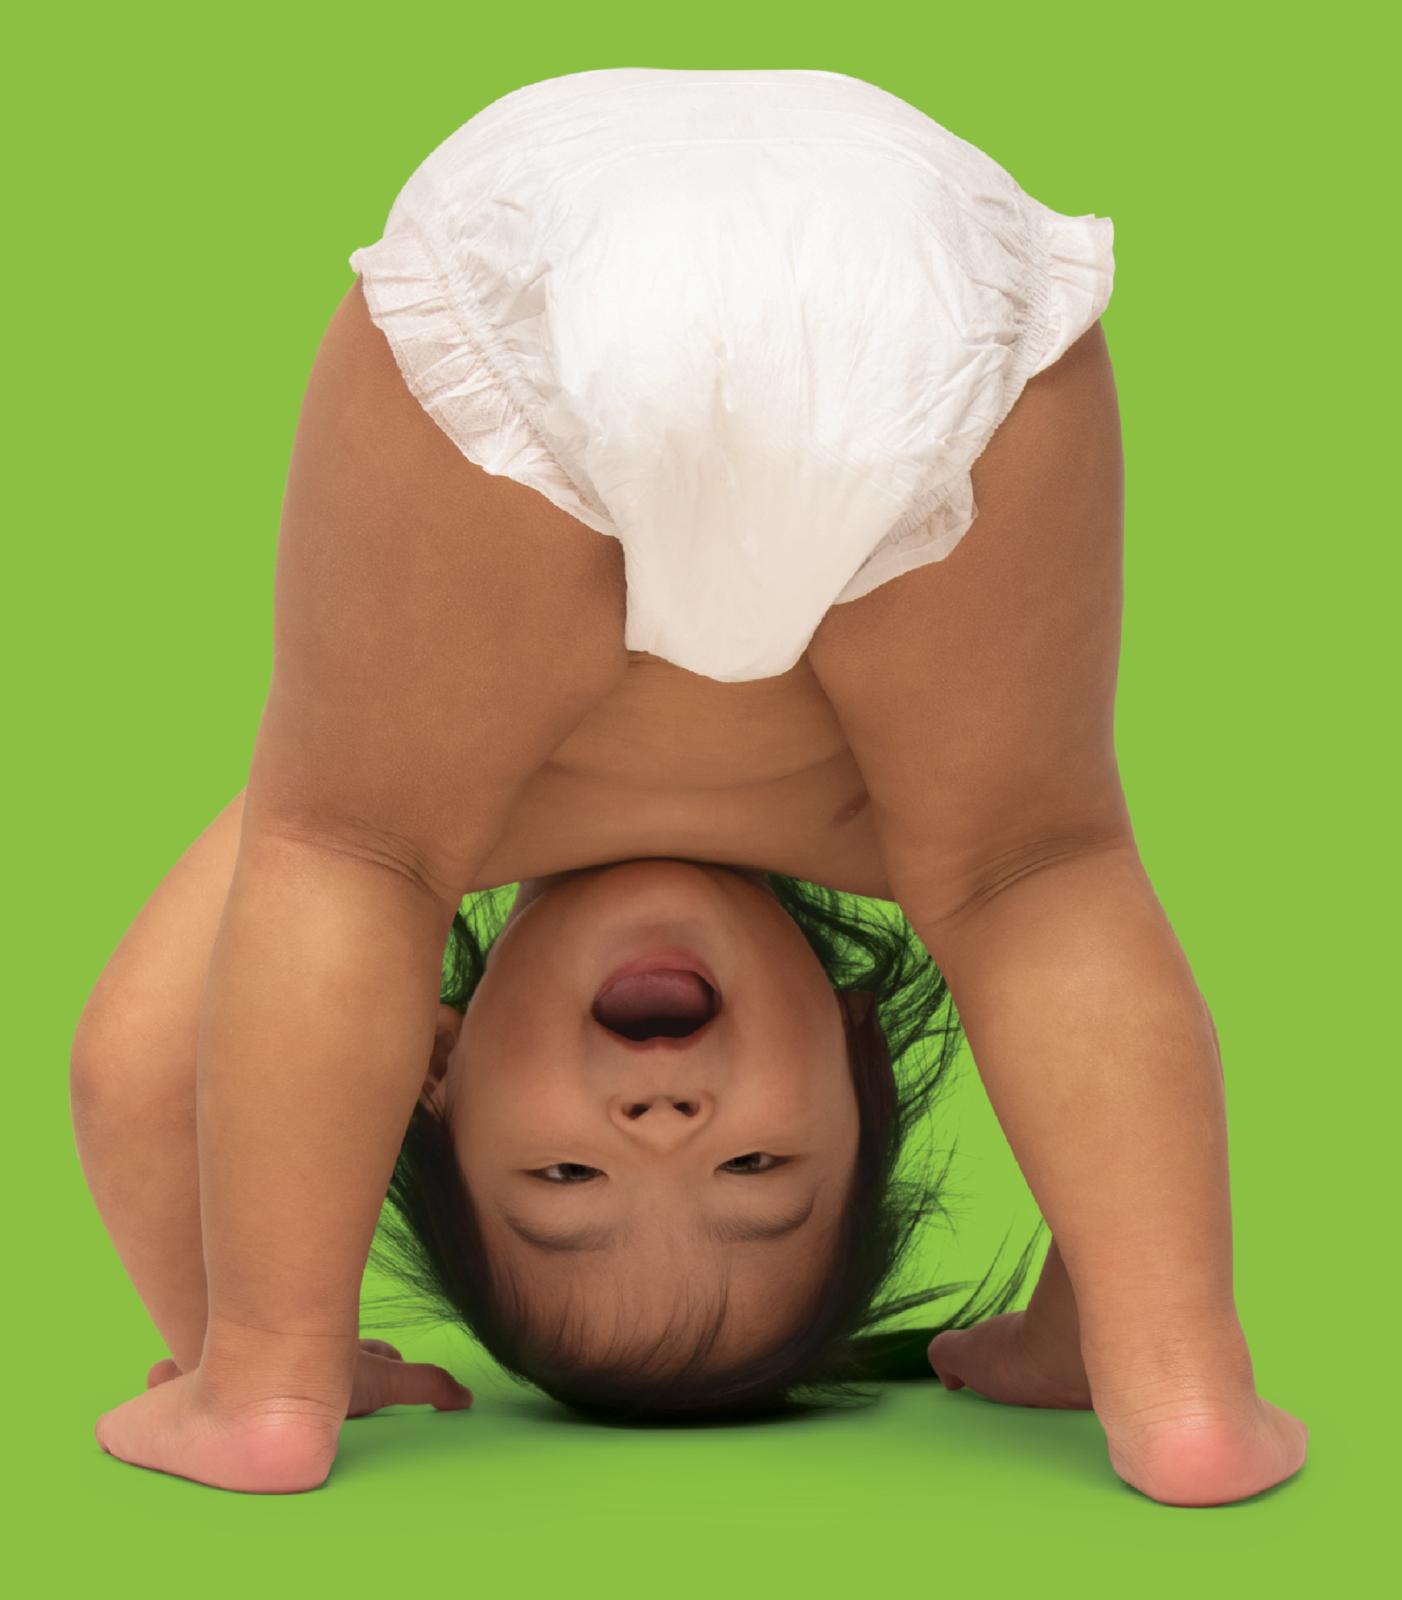 Get Diapers